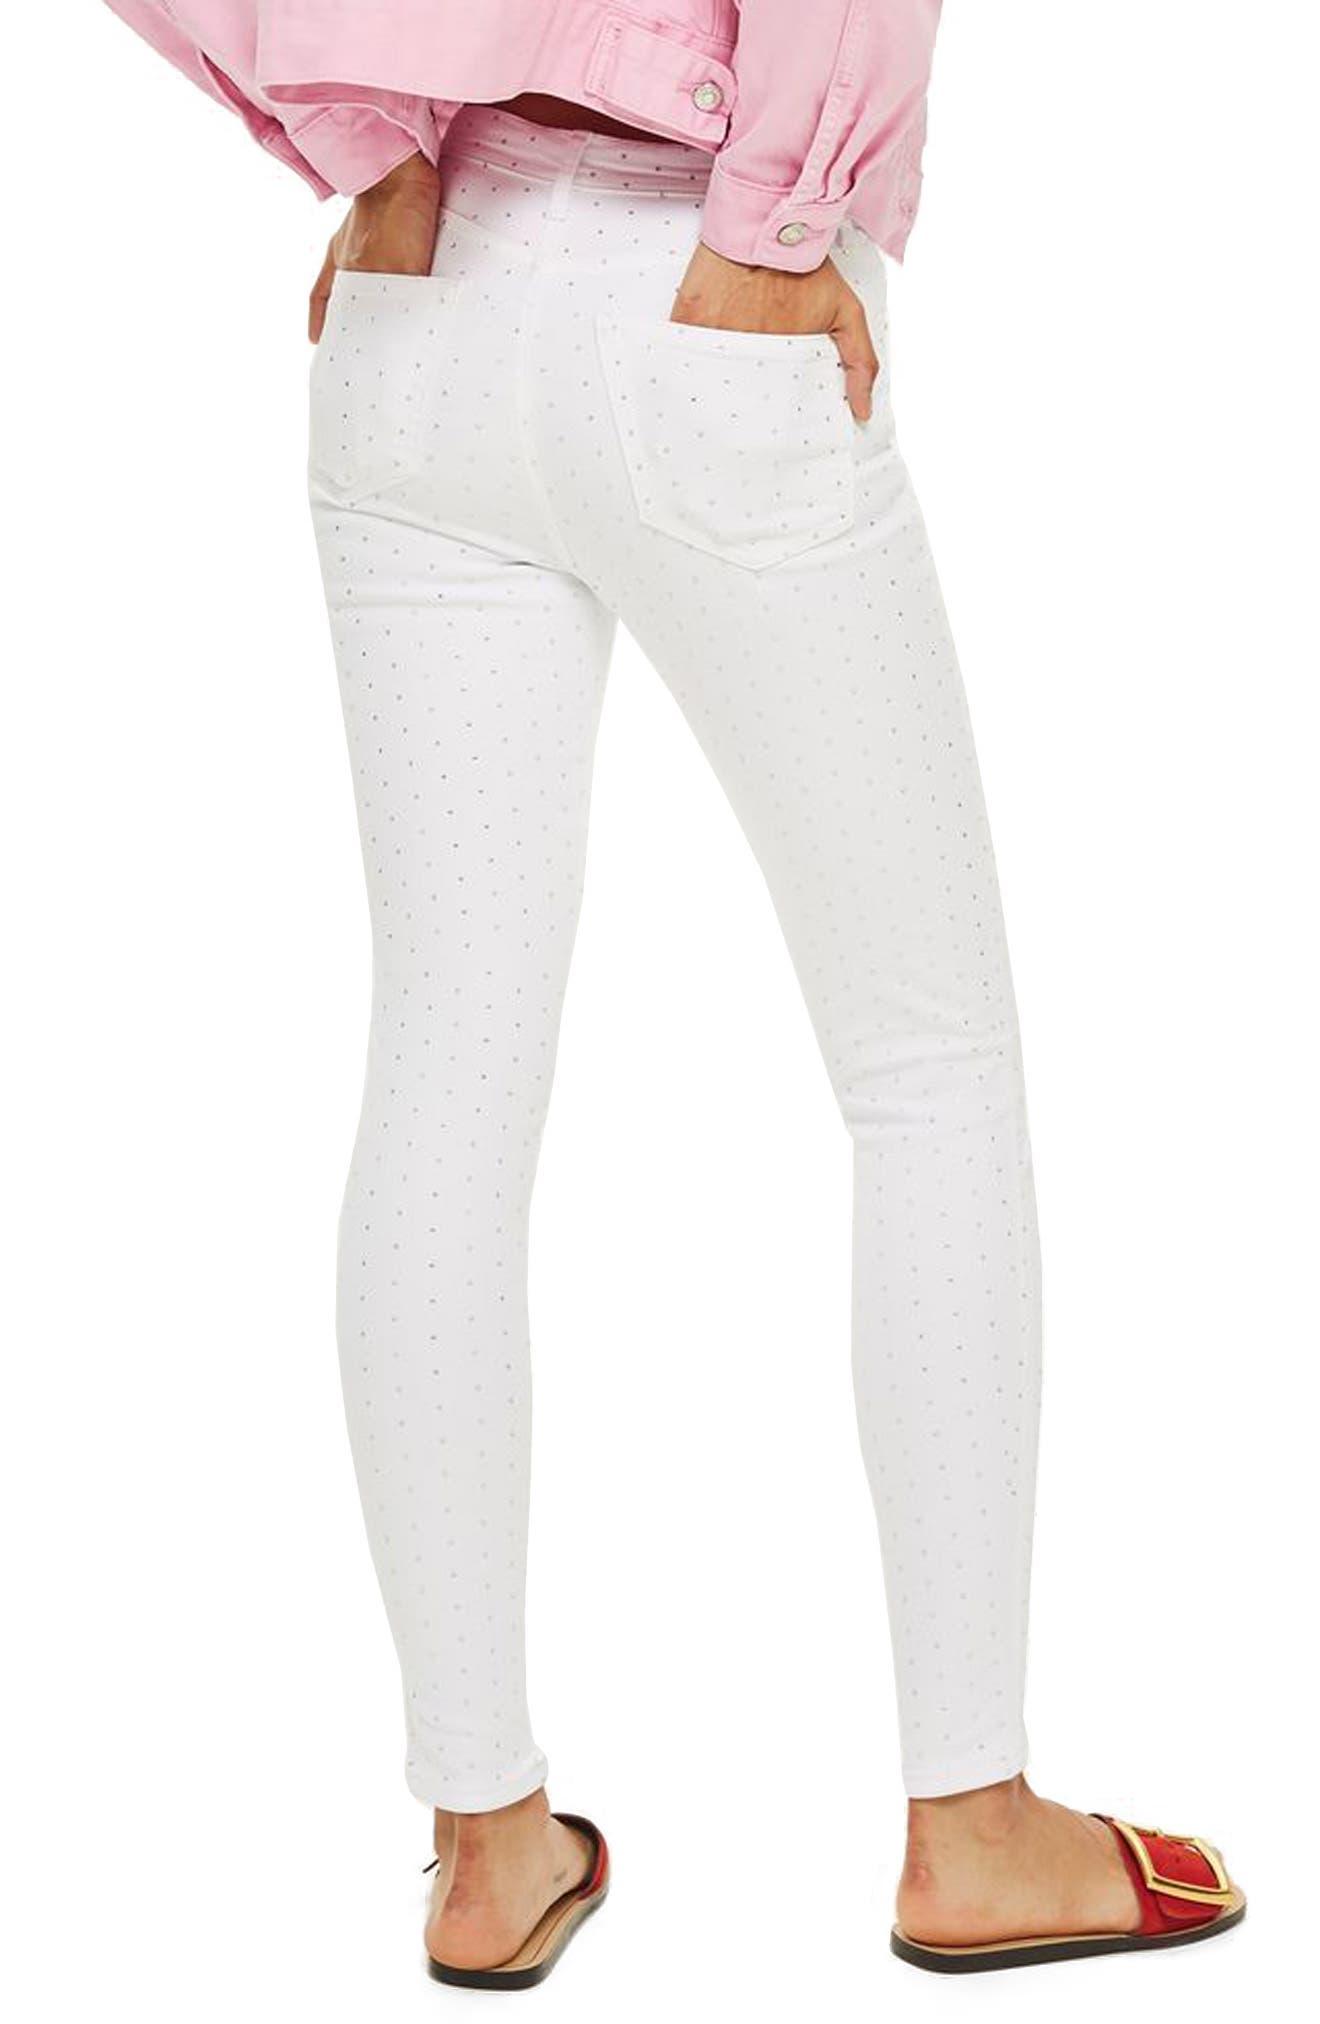 Jamie Diamante Skinny Jeans,                             Alternate thumbnail 2, color,                             White